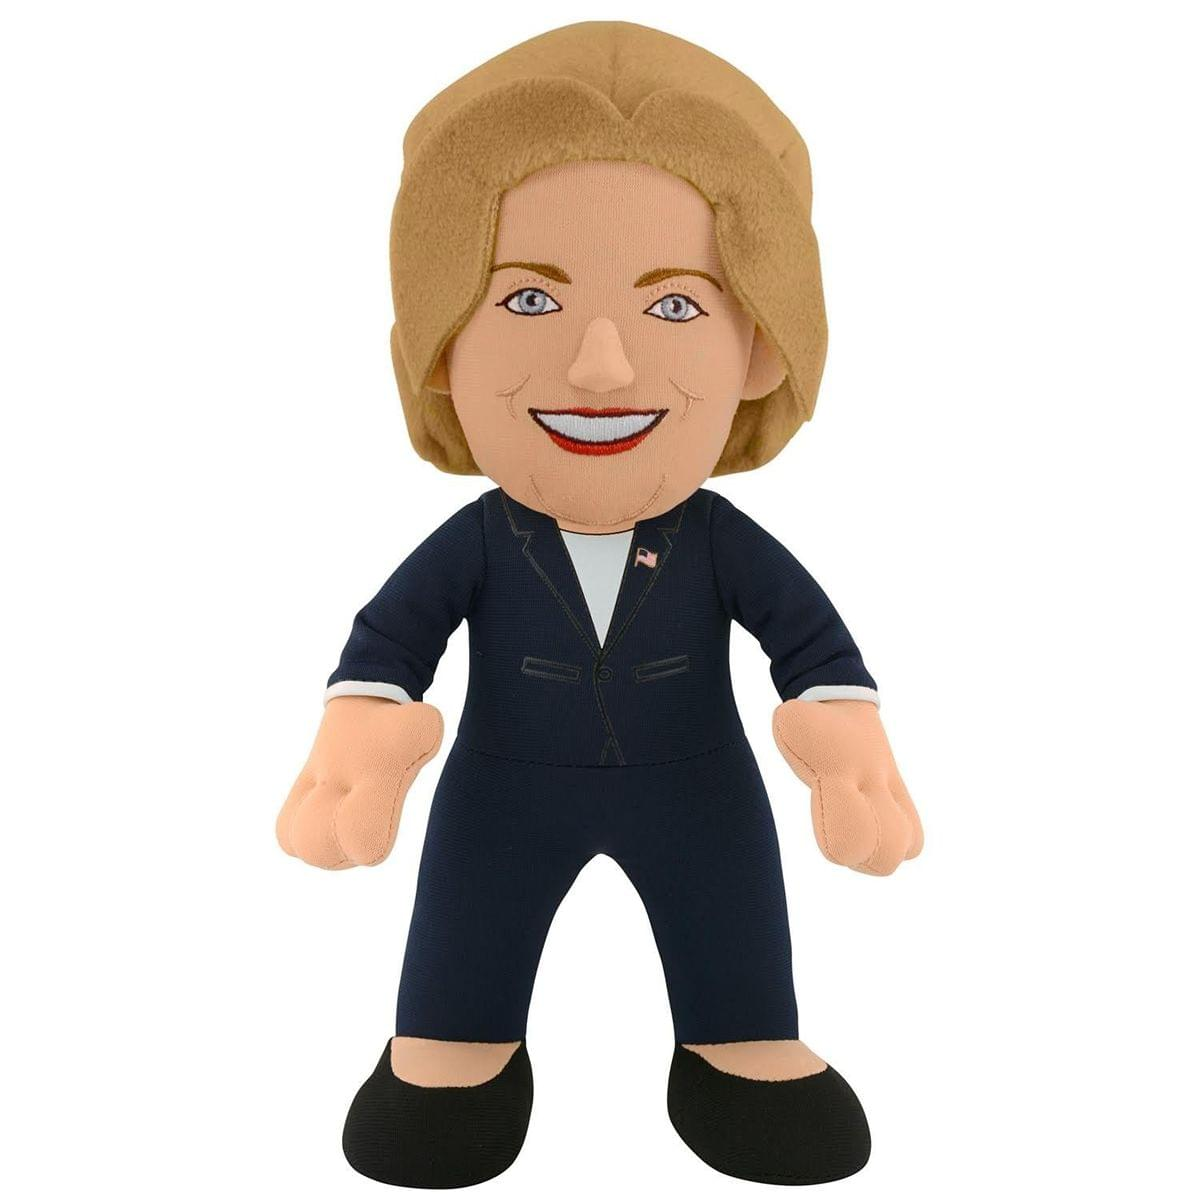 2016 Candidates Hillary Clinton 10